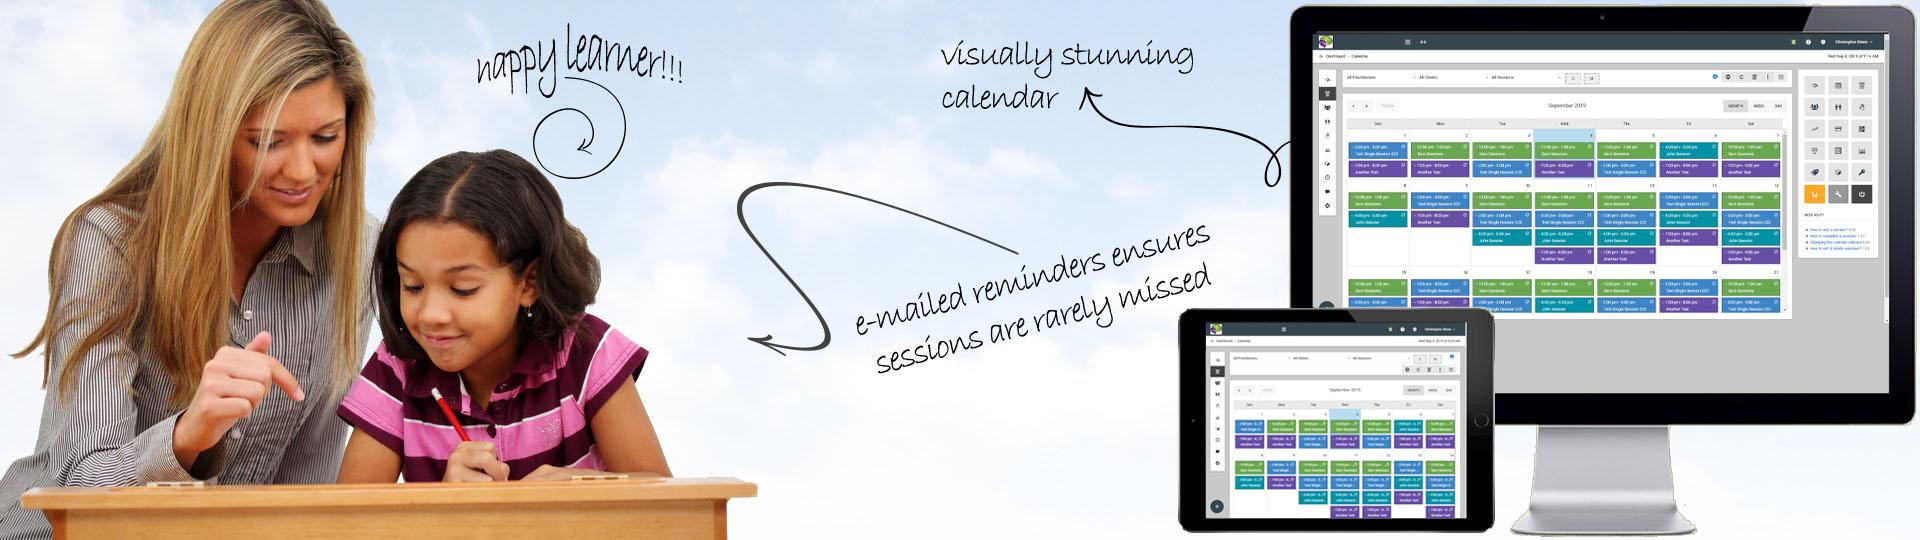 Tutor Scheduling Software for Tutors